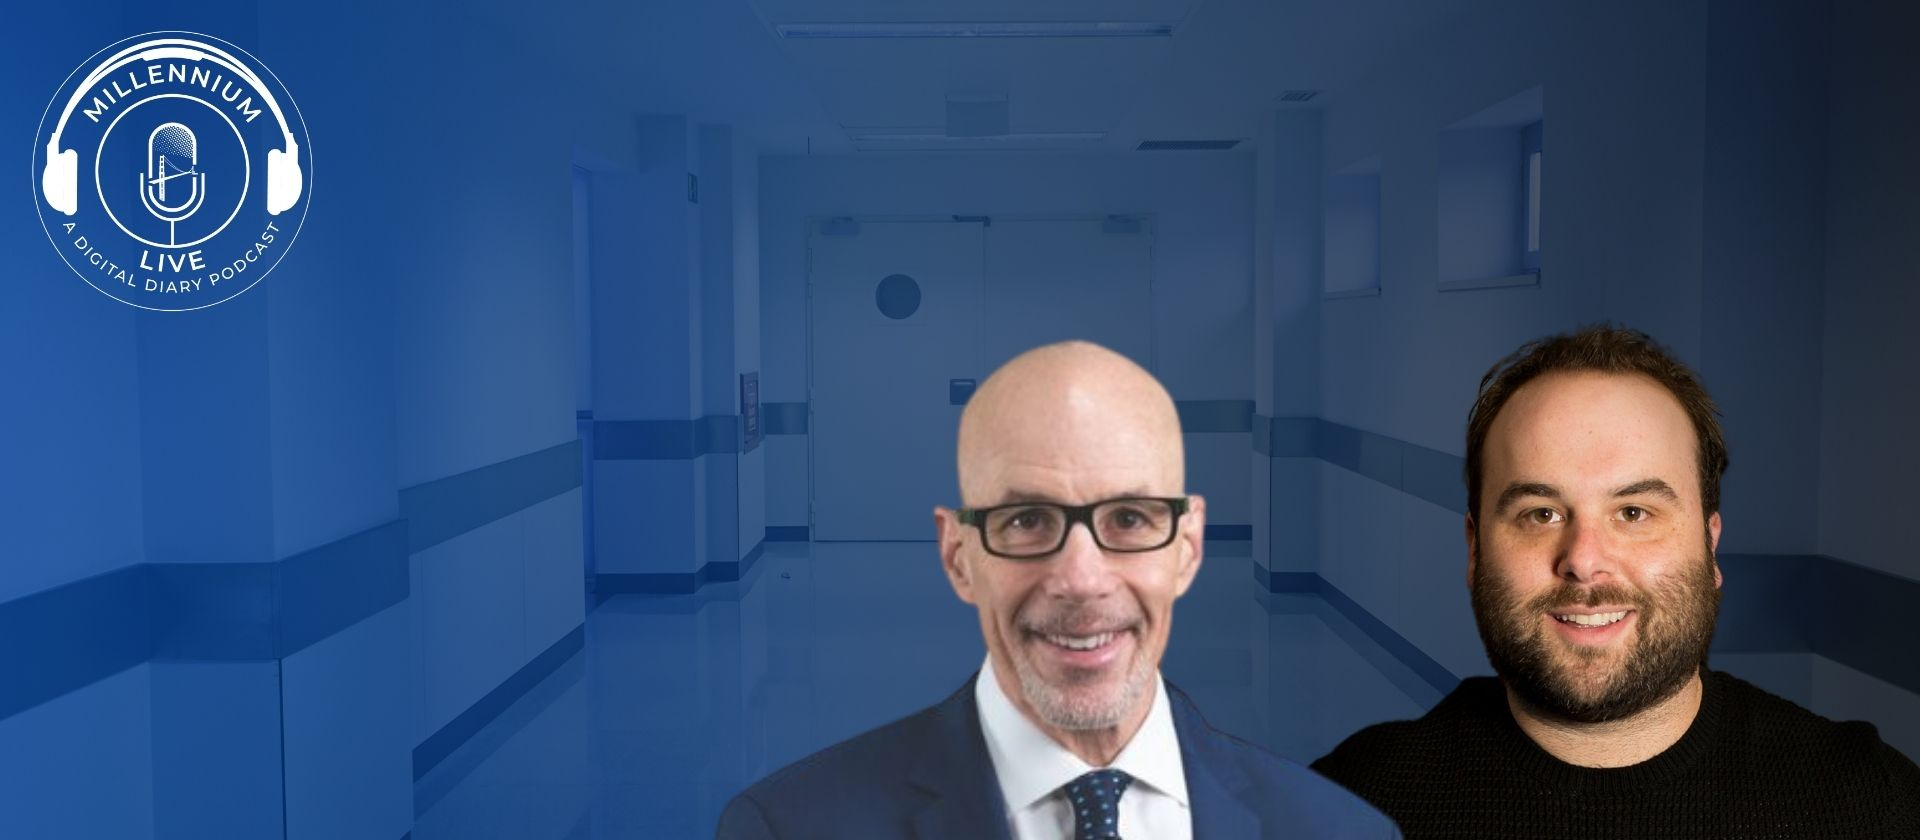 Dr. Stephen Klasko Talks Healthcare Transformation on #MillenniumLive